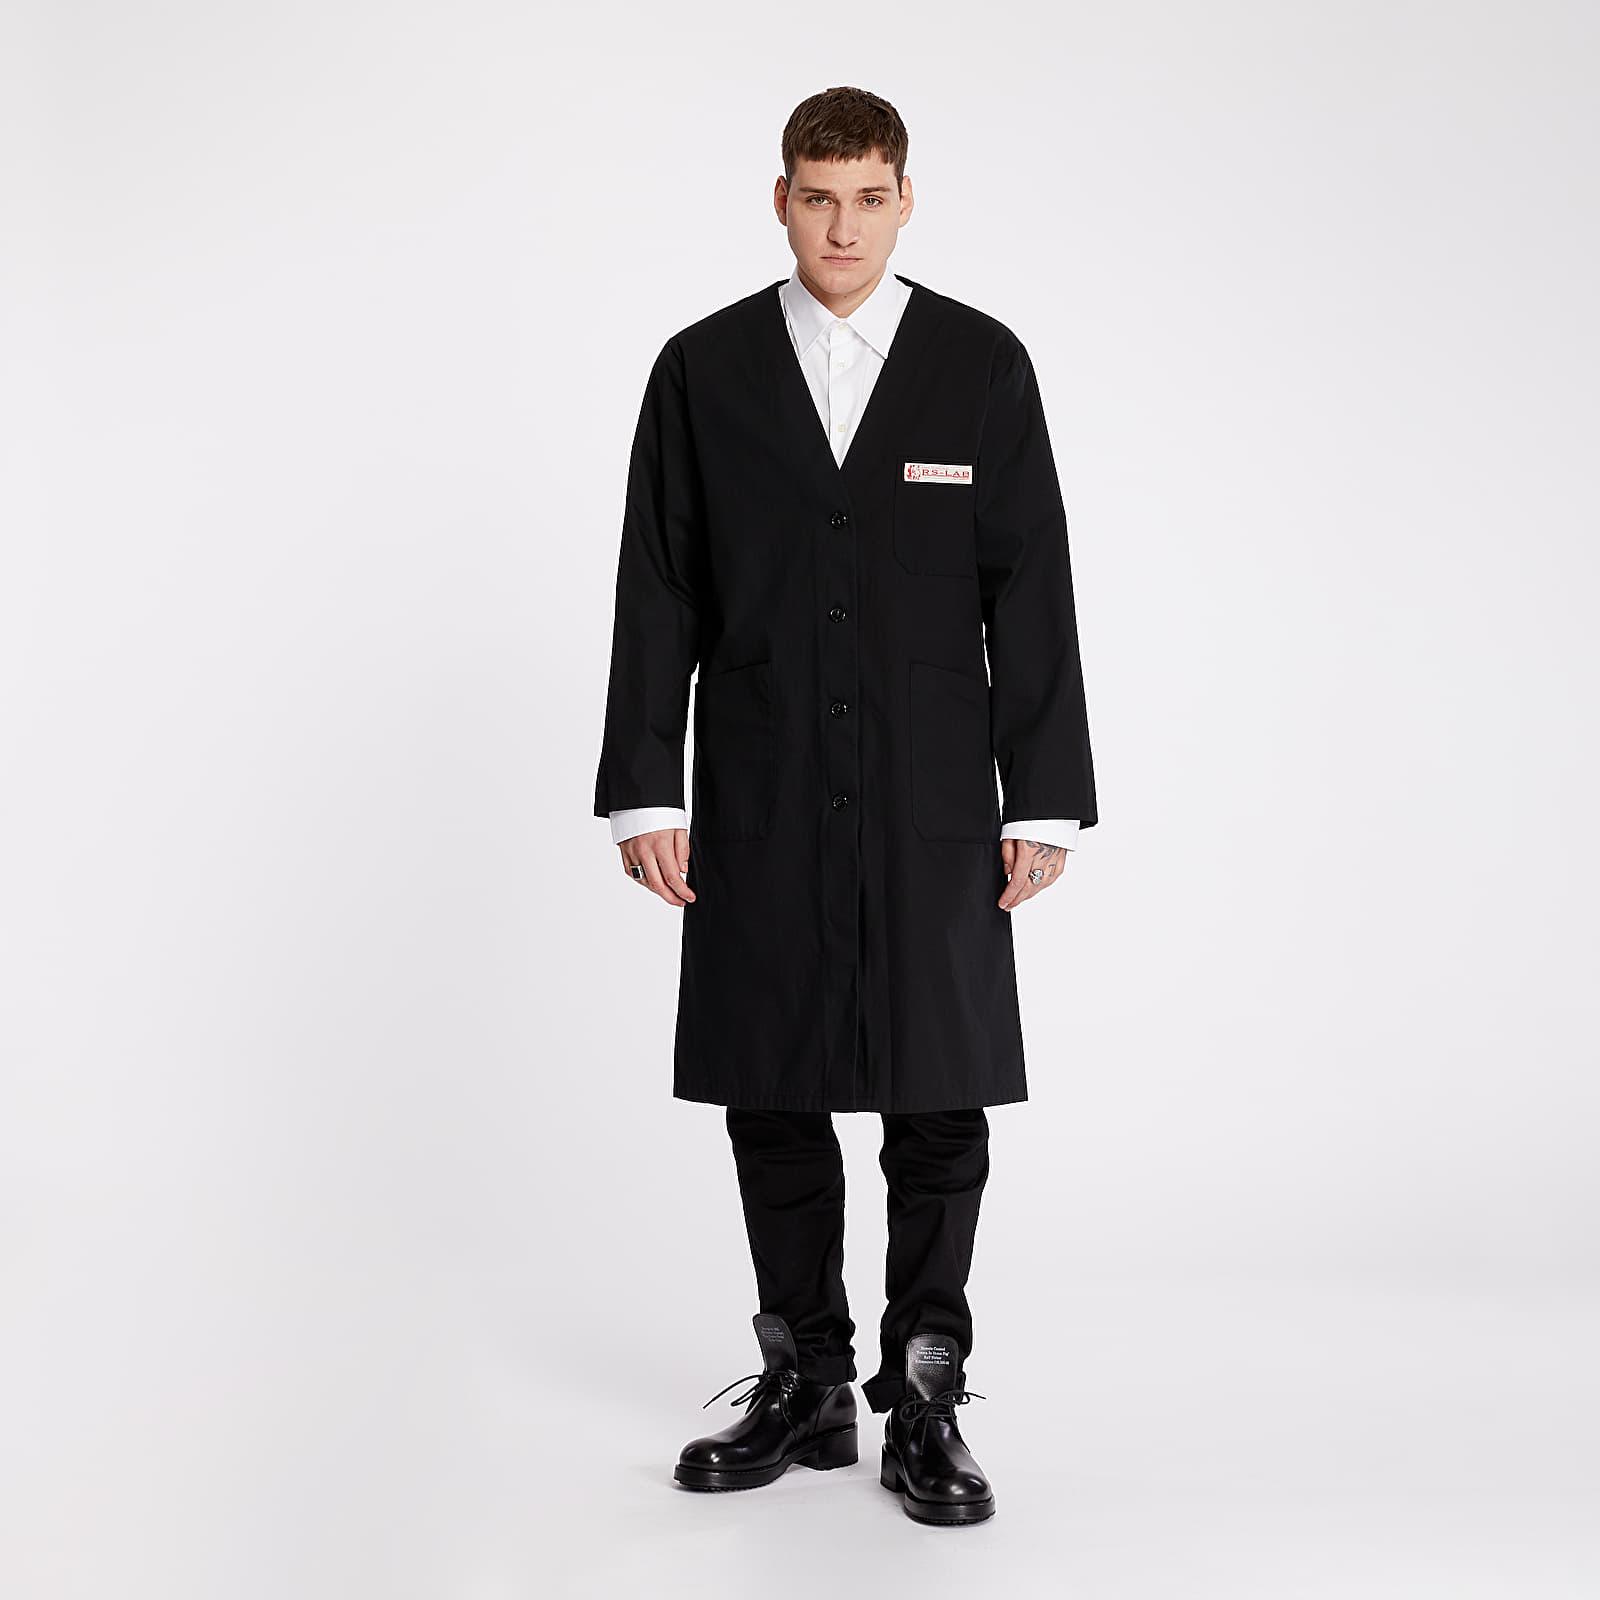 Kabáty RAF SIMONS Classic Labo Coat Black